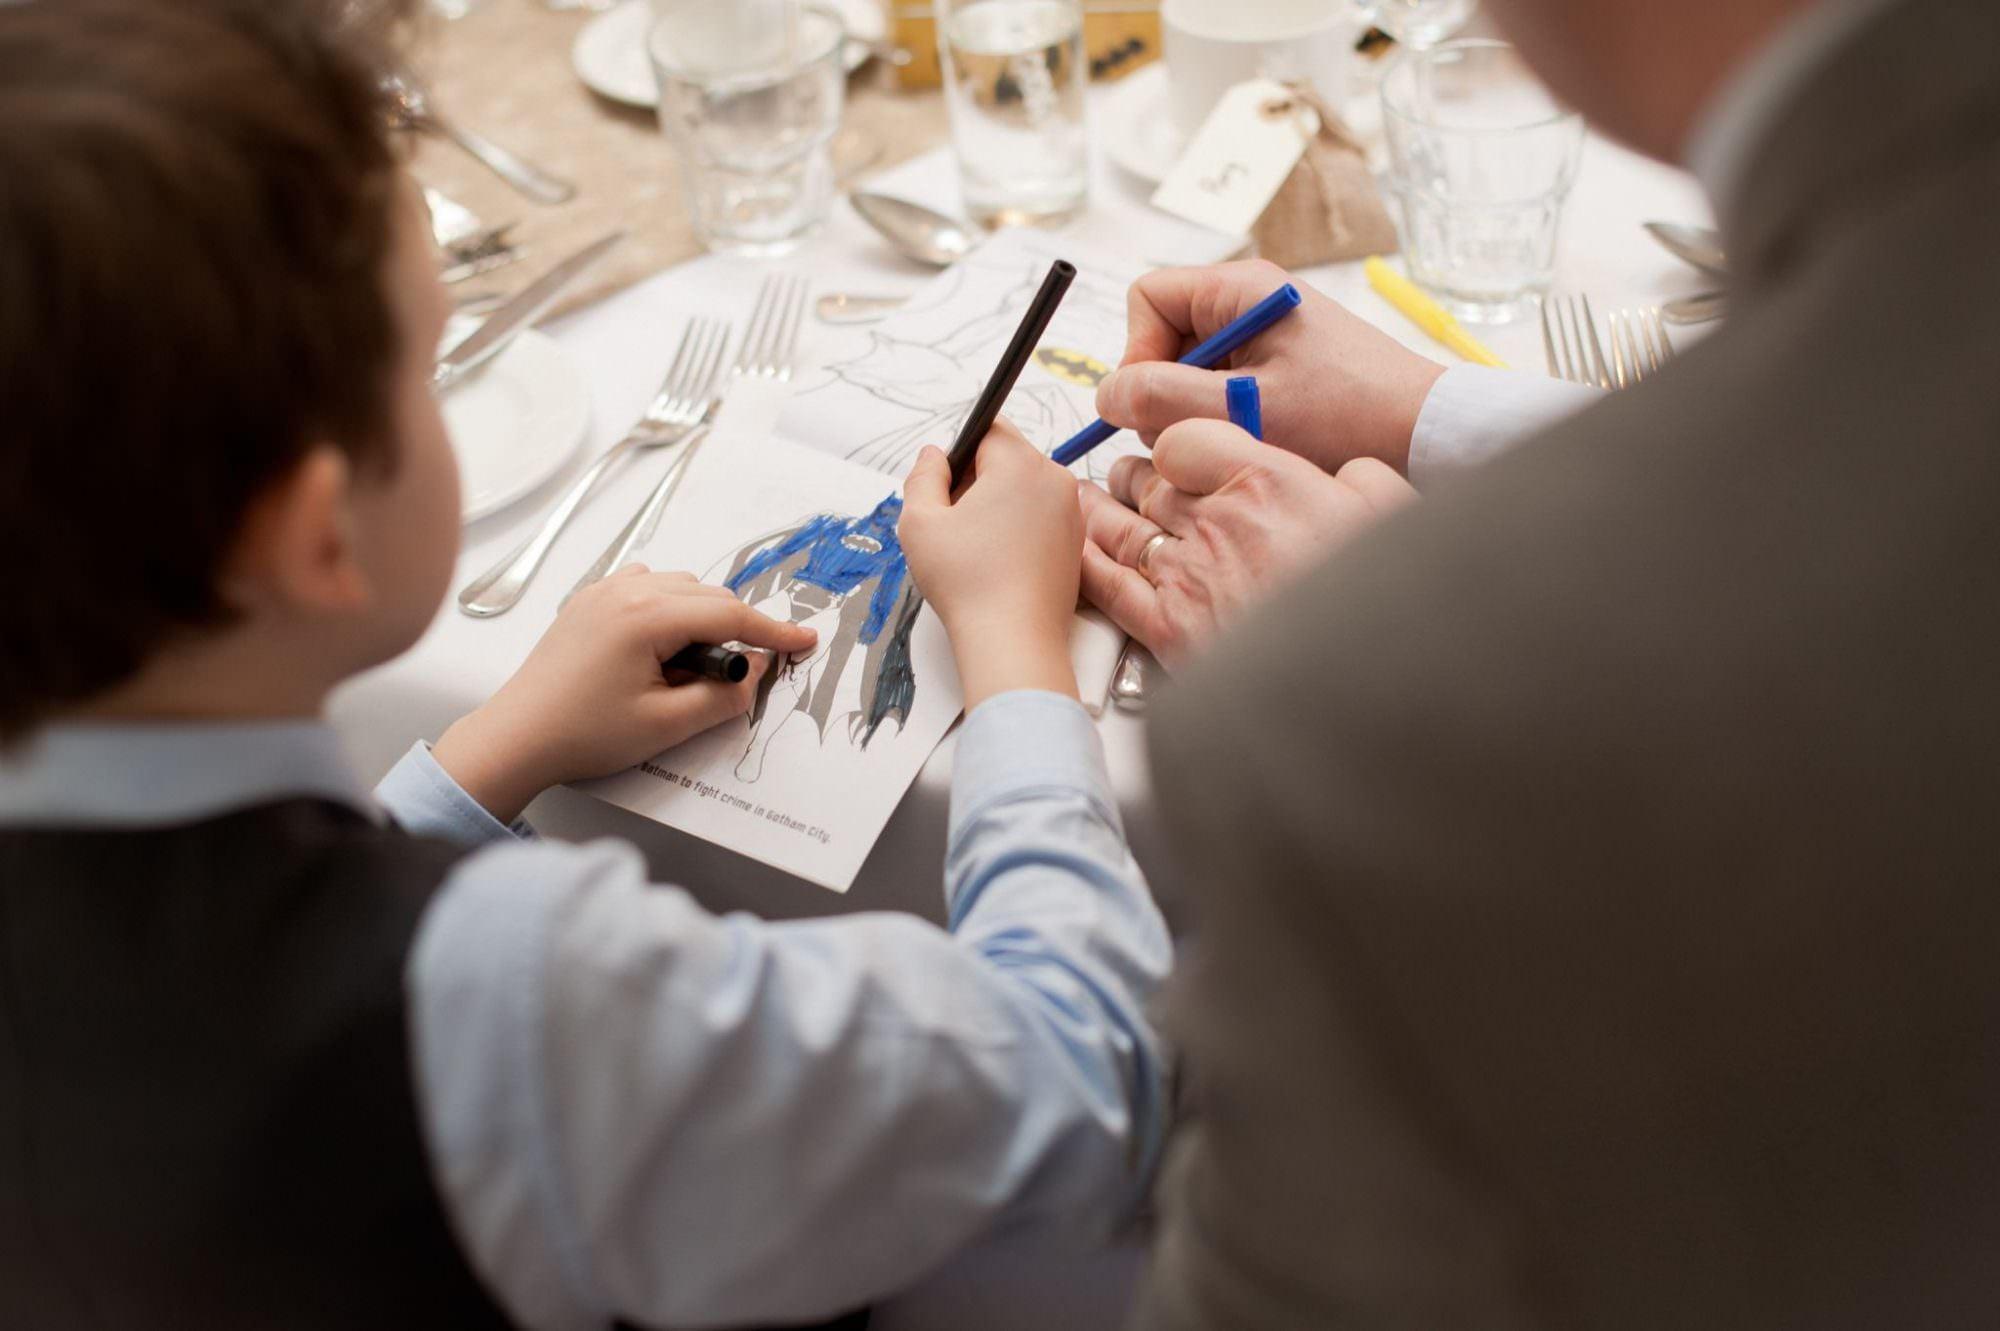 Children Colouring Book at Wedding